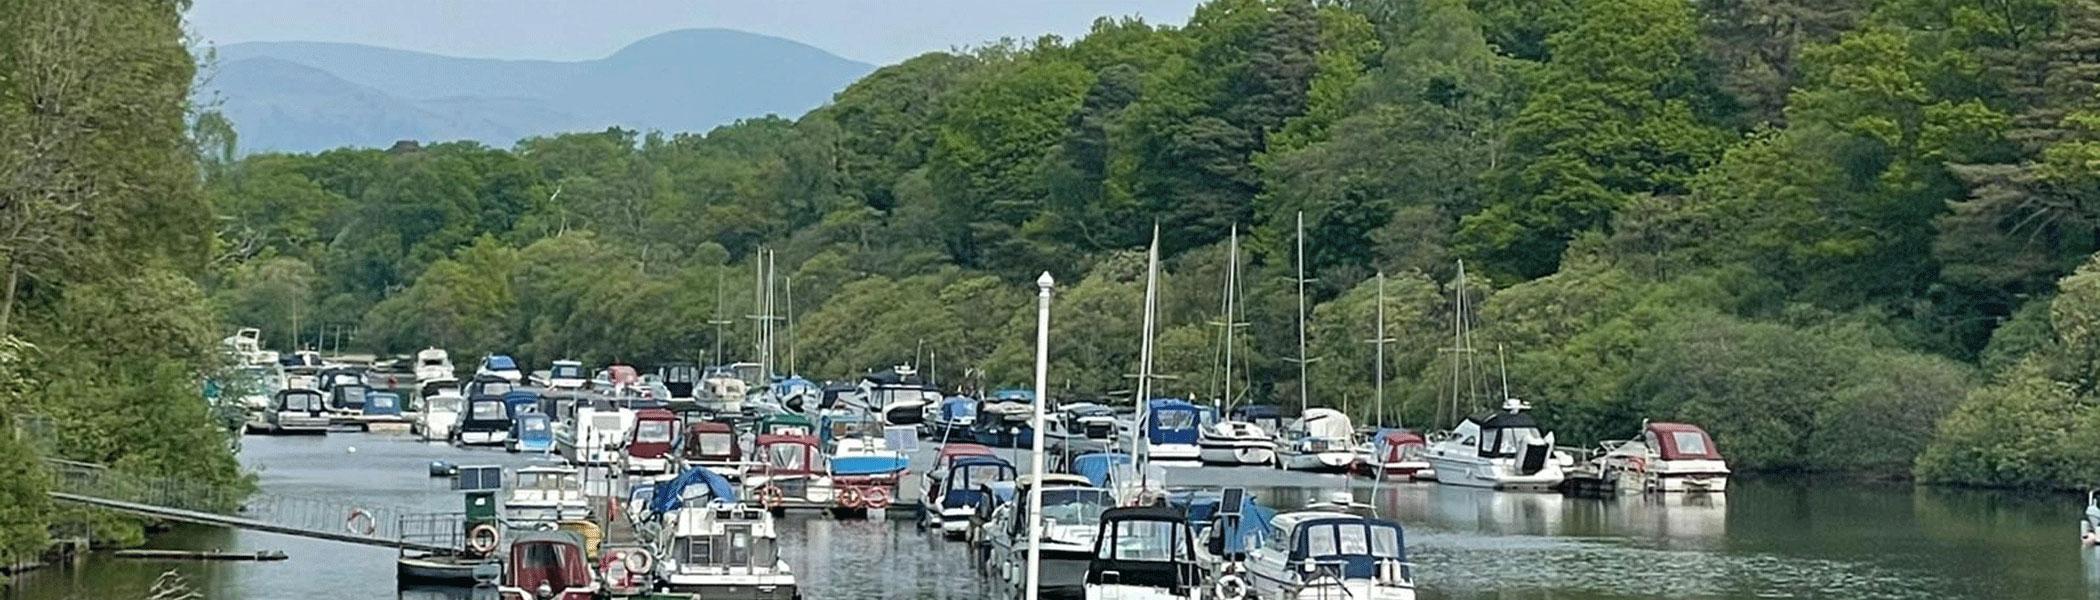 Balloch.co.uk Loch Lomond